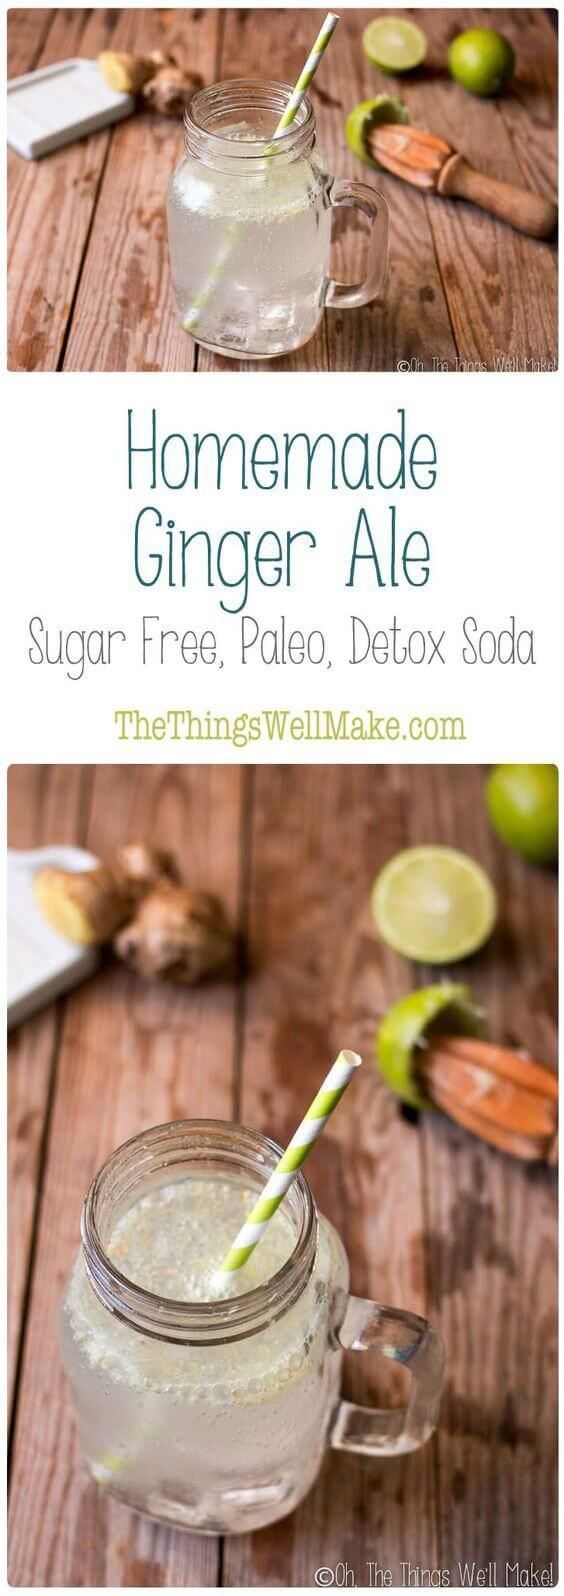 Homemade Ginger Ale - Sugar Free and Paleo